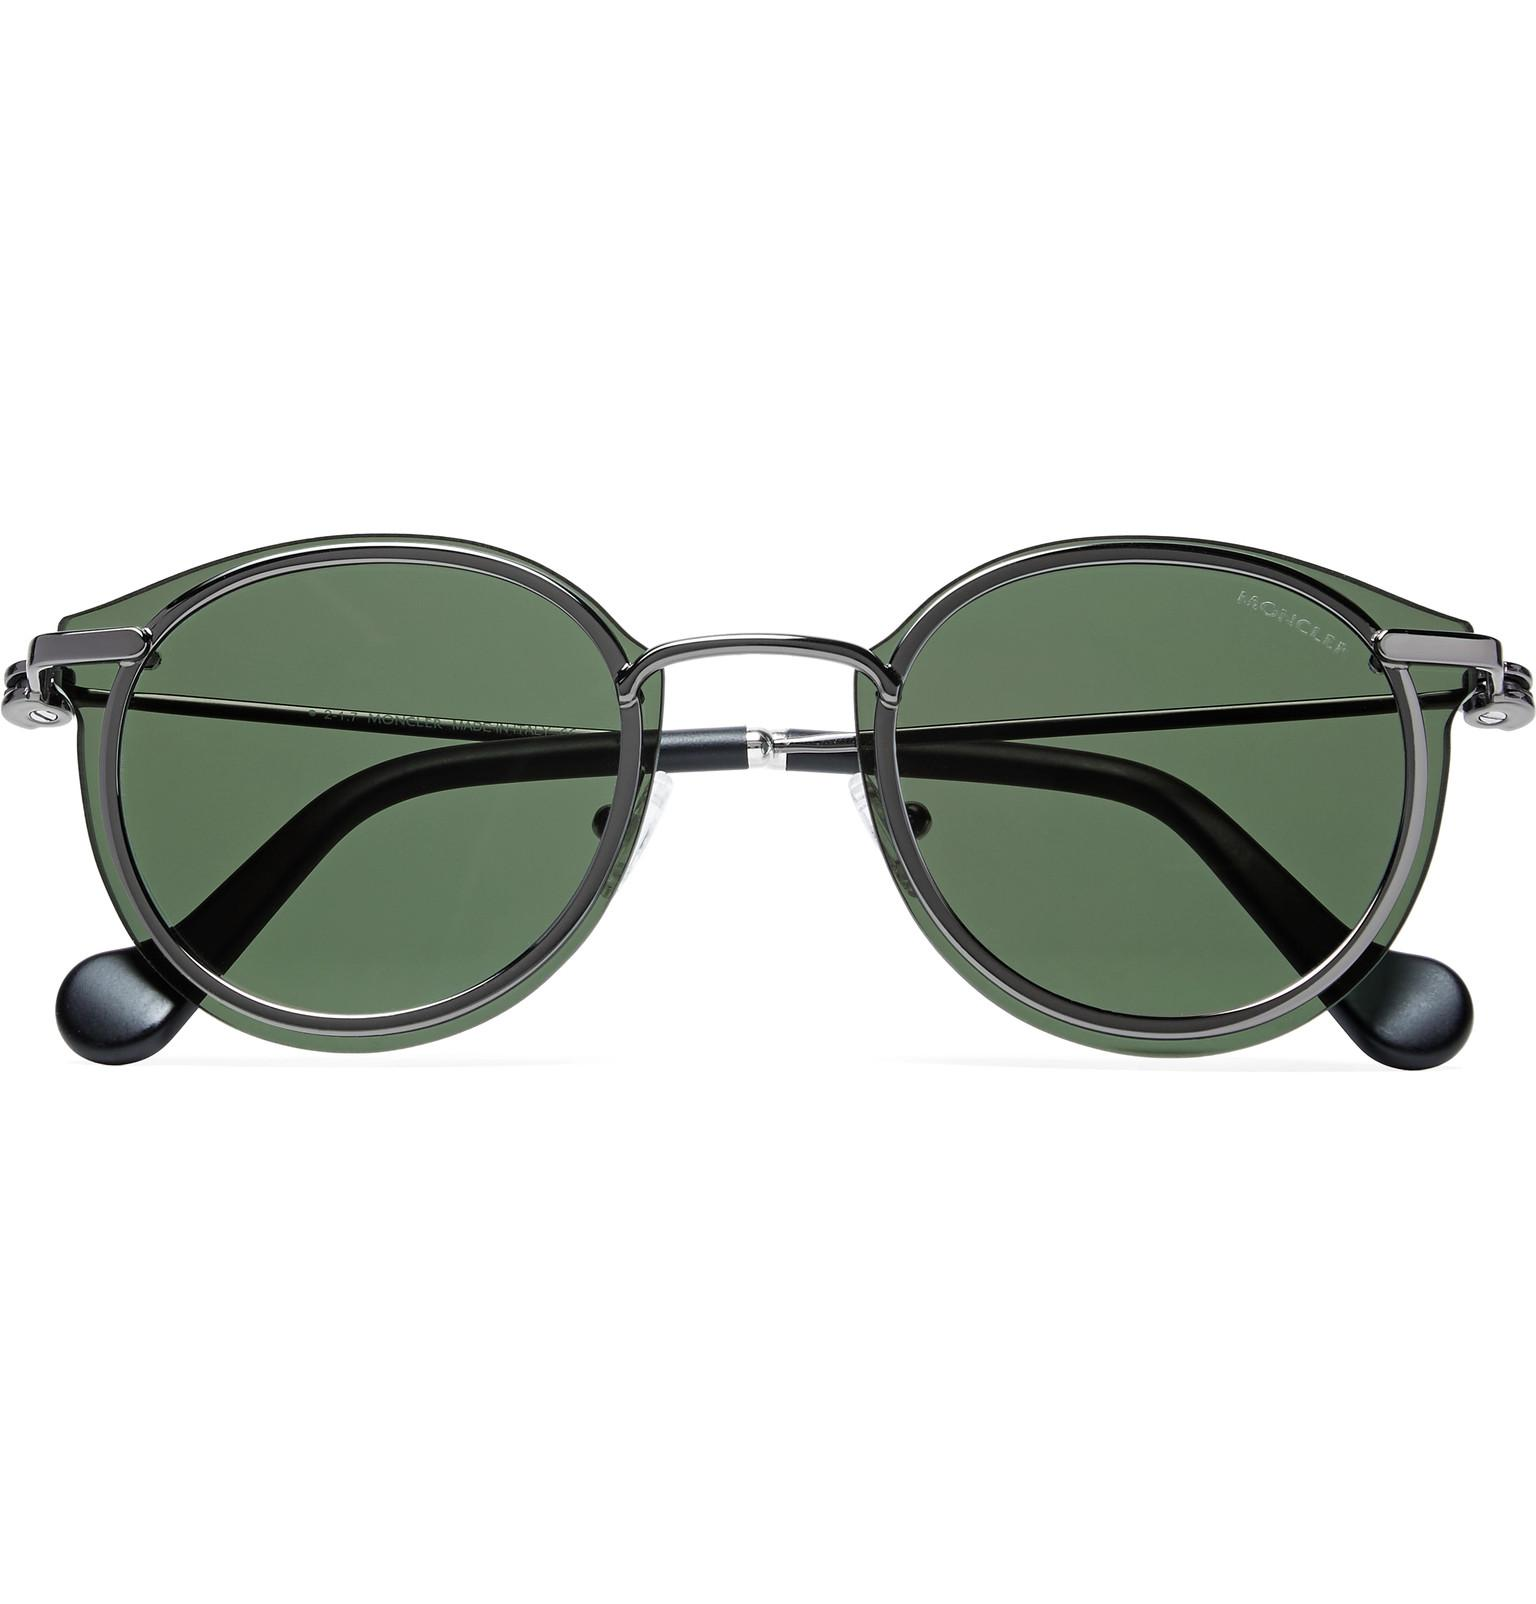 Round-frame metal sunglasses Moncler 8VuJW7SF7